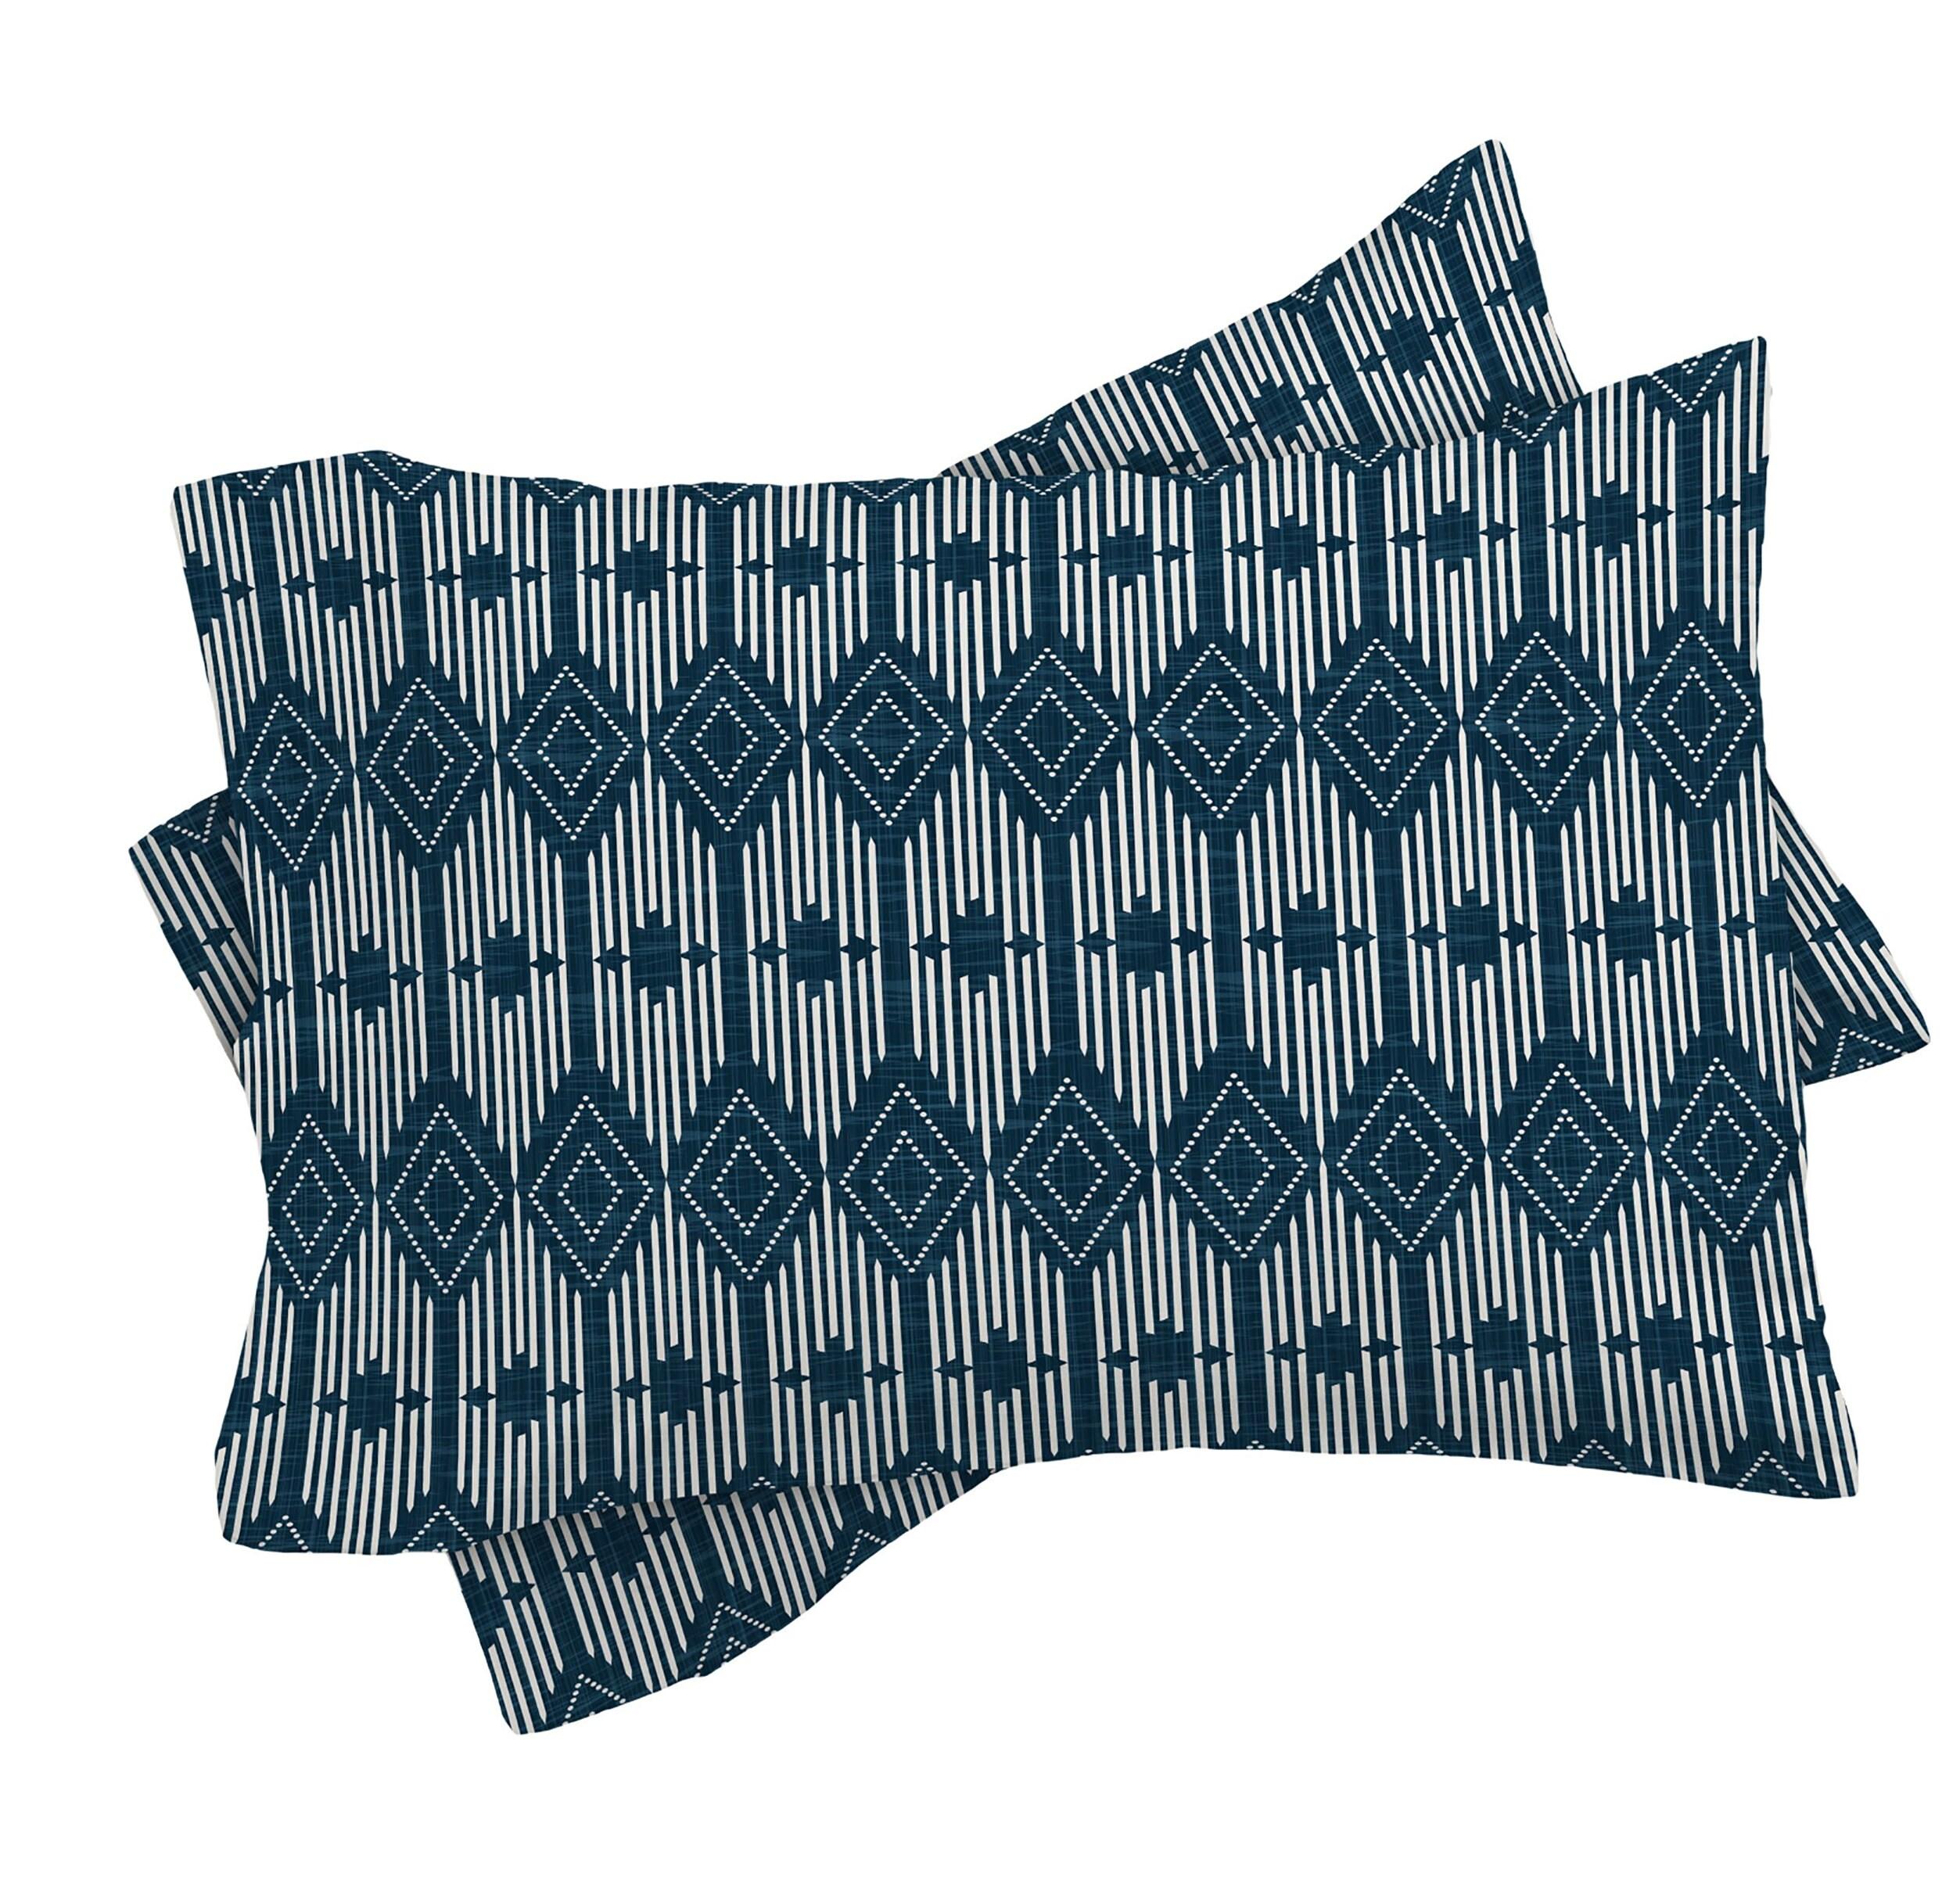 Couverture de couette // Blue Geometric // Twin, Queen, King Sizes // Home Decor // Retro Geometric // West End Midnight Design // Literdding // Blue Bed